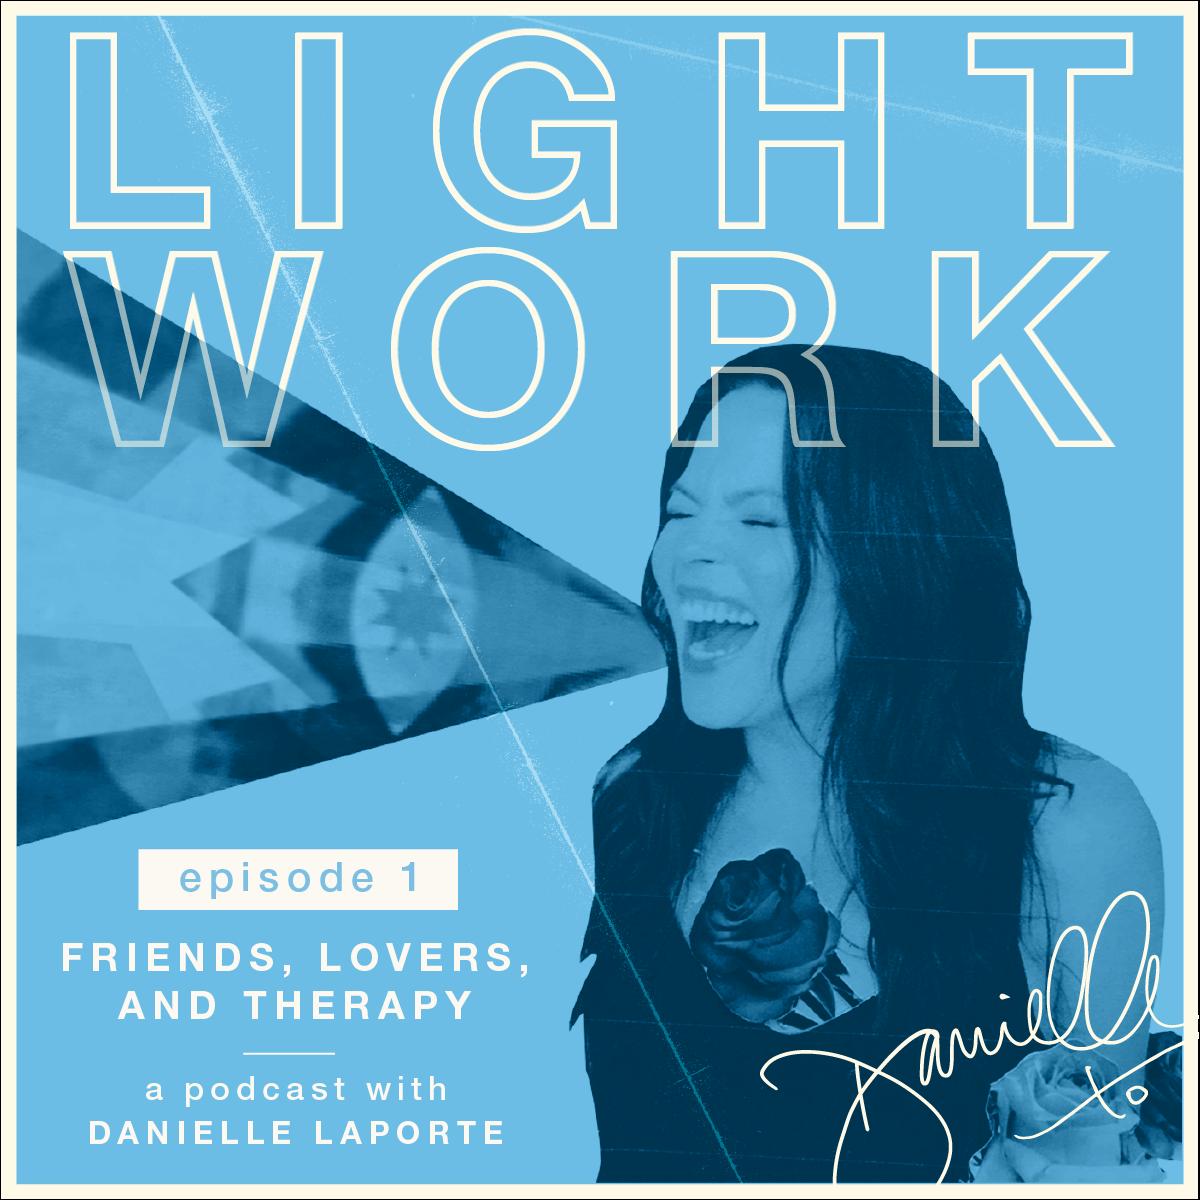 Danielle LaPorte Lightwork